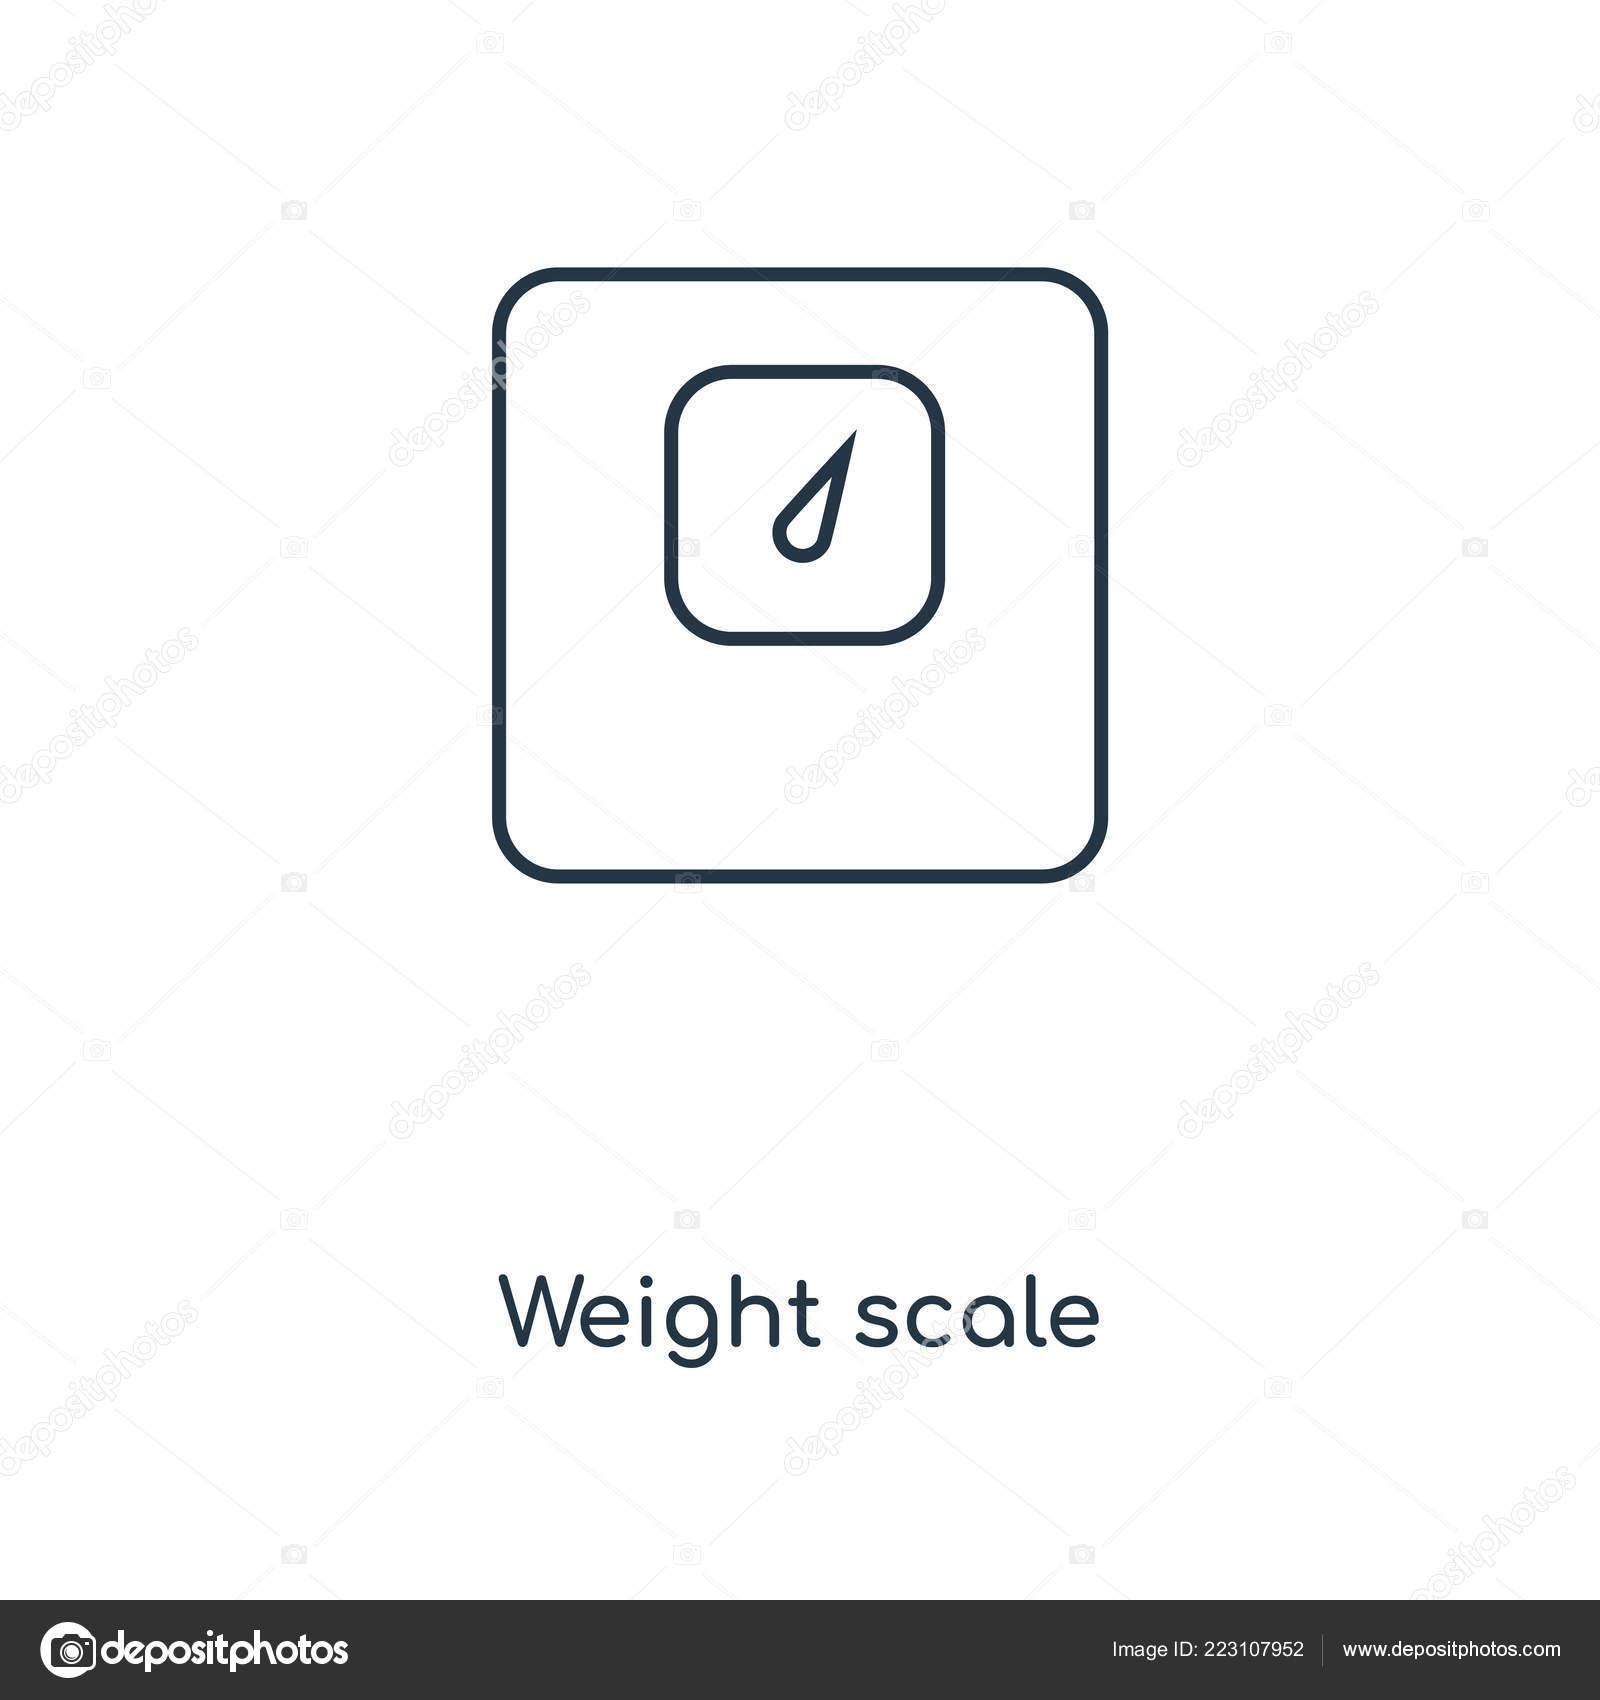 veszteség súly jele